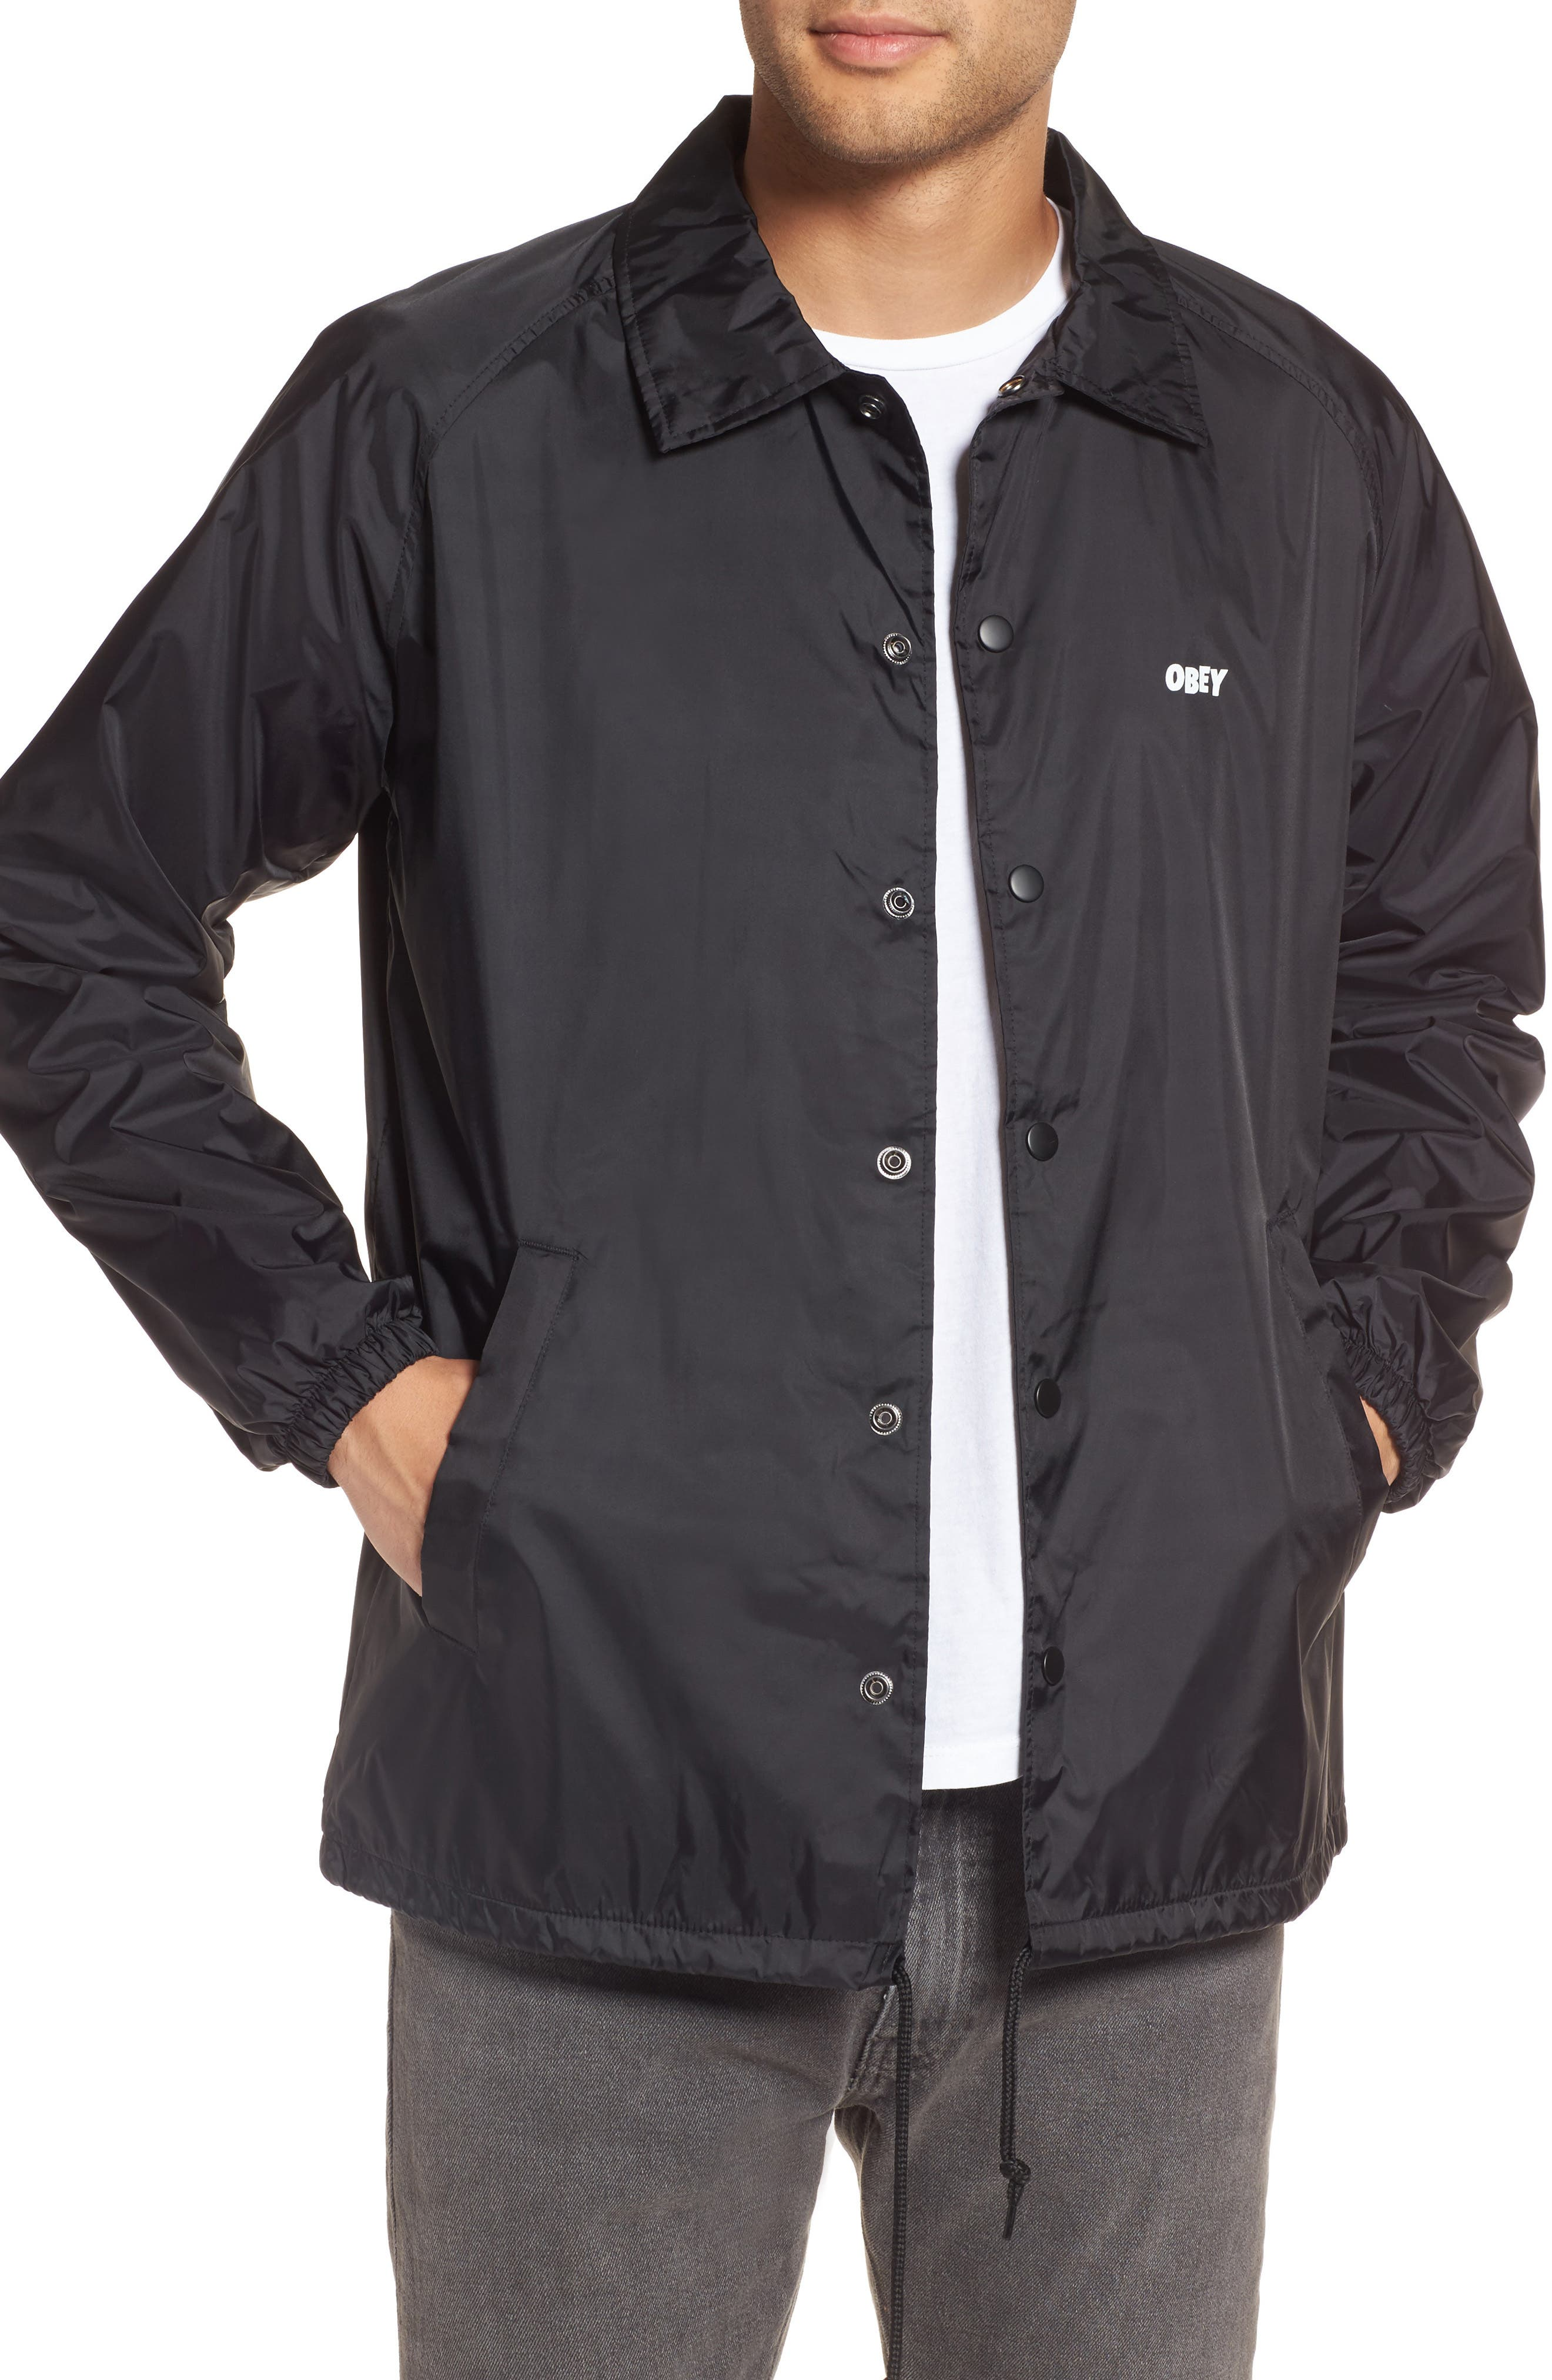 Lo-Fi Graphic Coach's Jacket,                             Main thumbnail 1, color,                             001